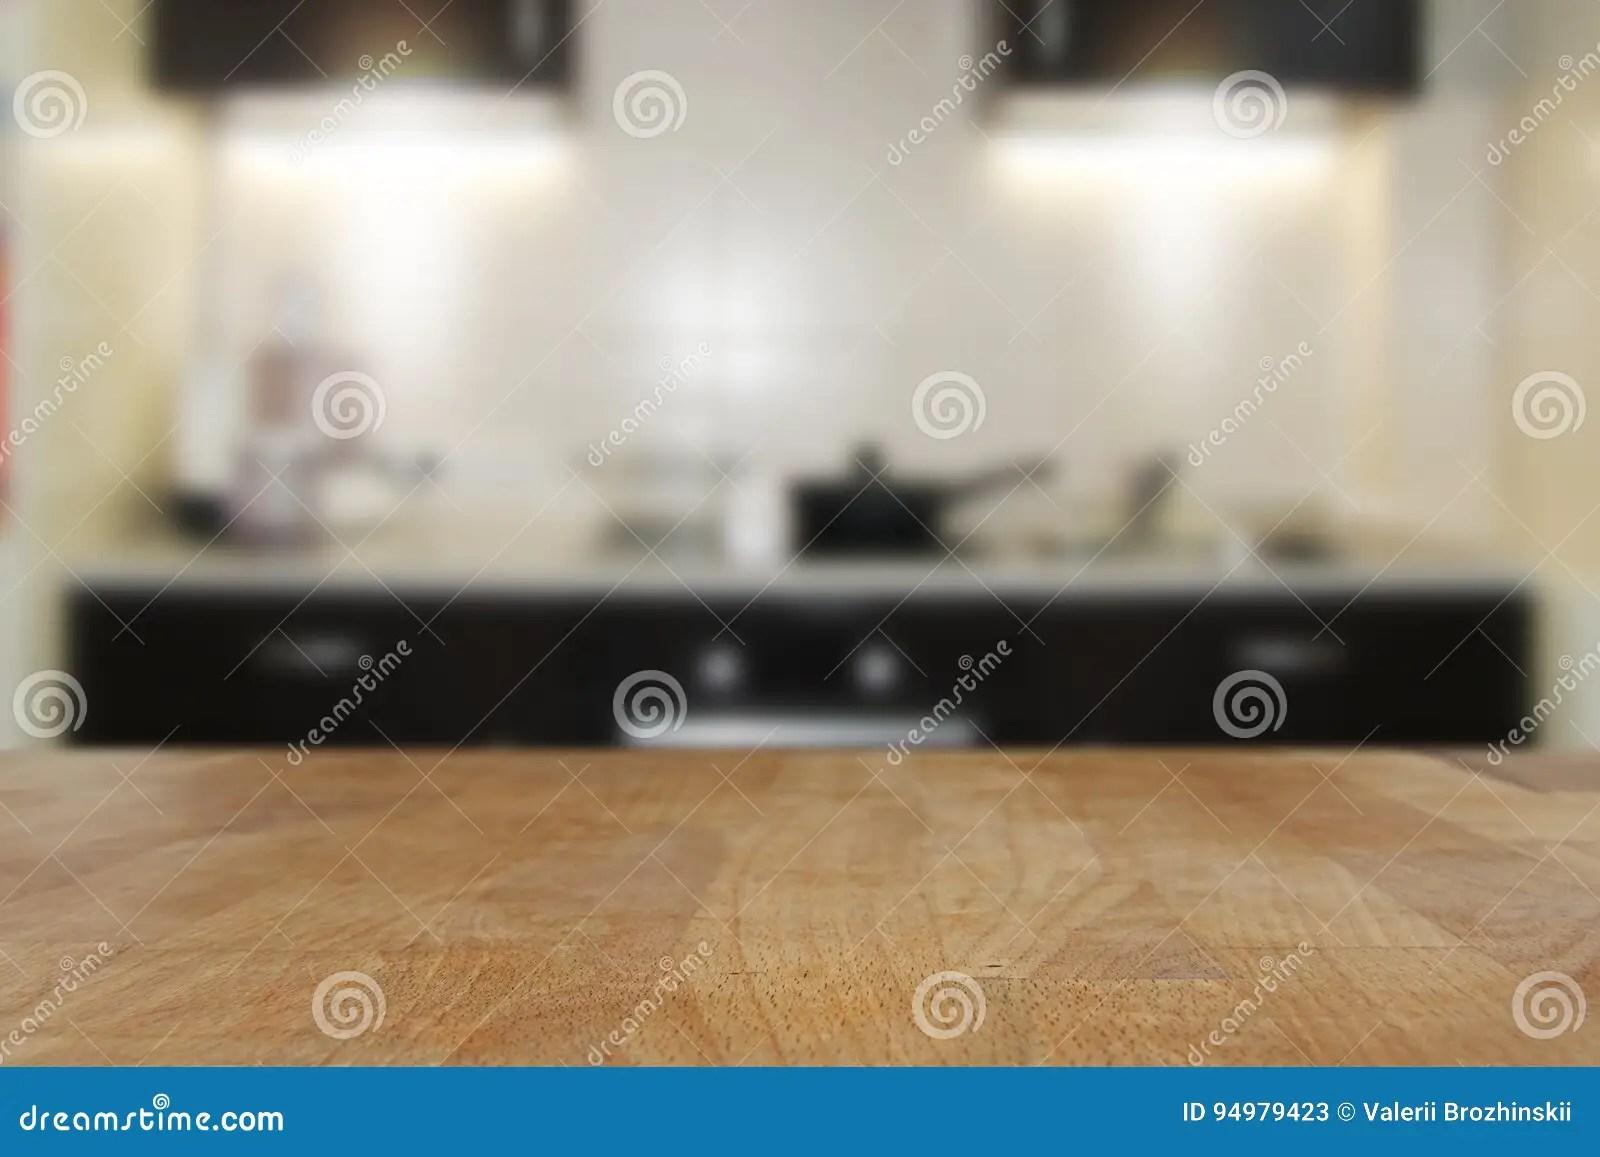 wood table kitchen best sink material 木顶面桌有被弄脏的厨房内部背景库存图片 图片包括有browne 墙壁 背包 在厨房内部背景的木桌